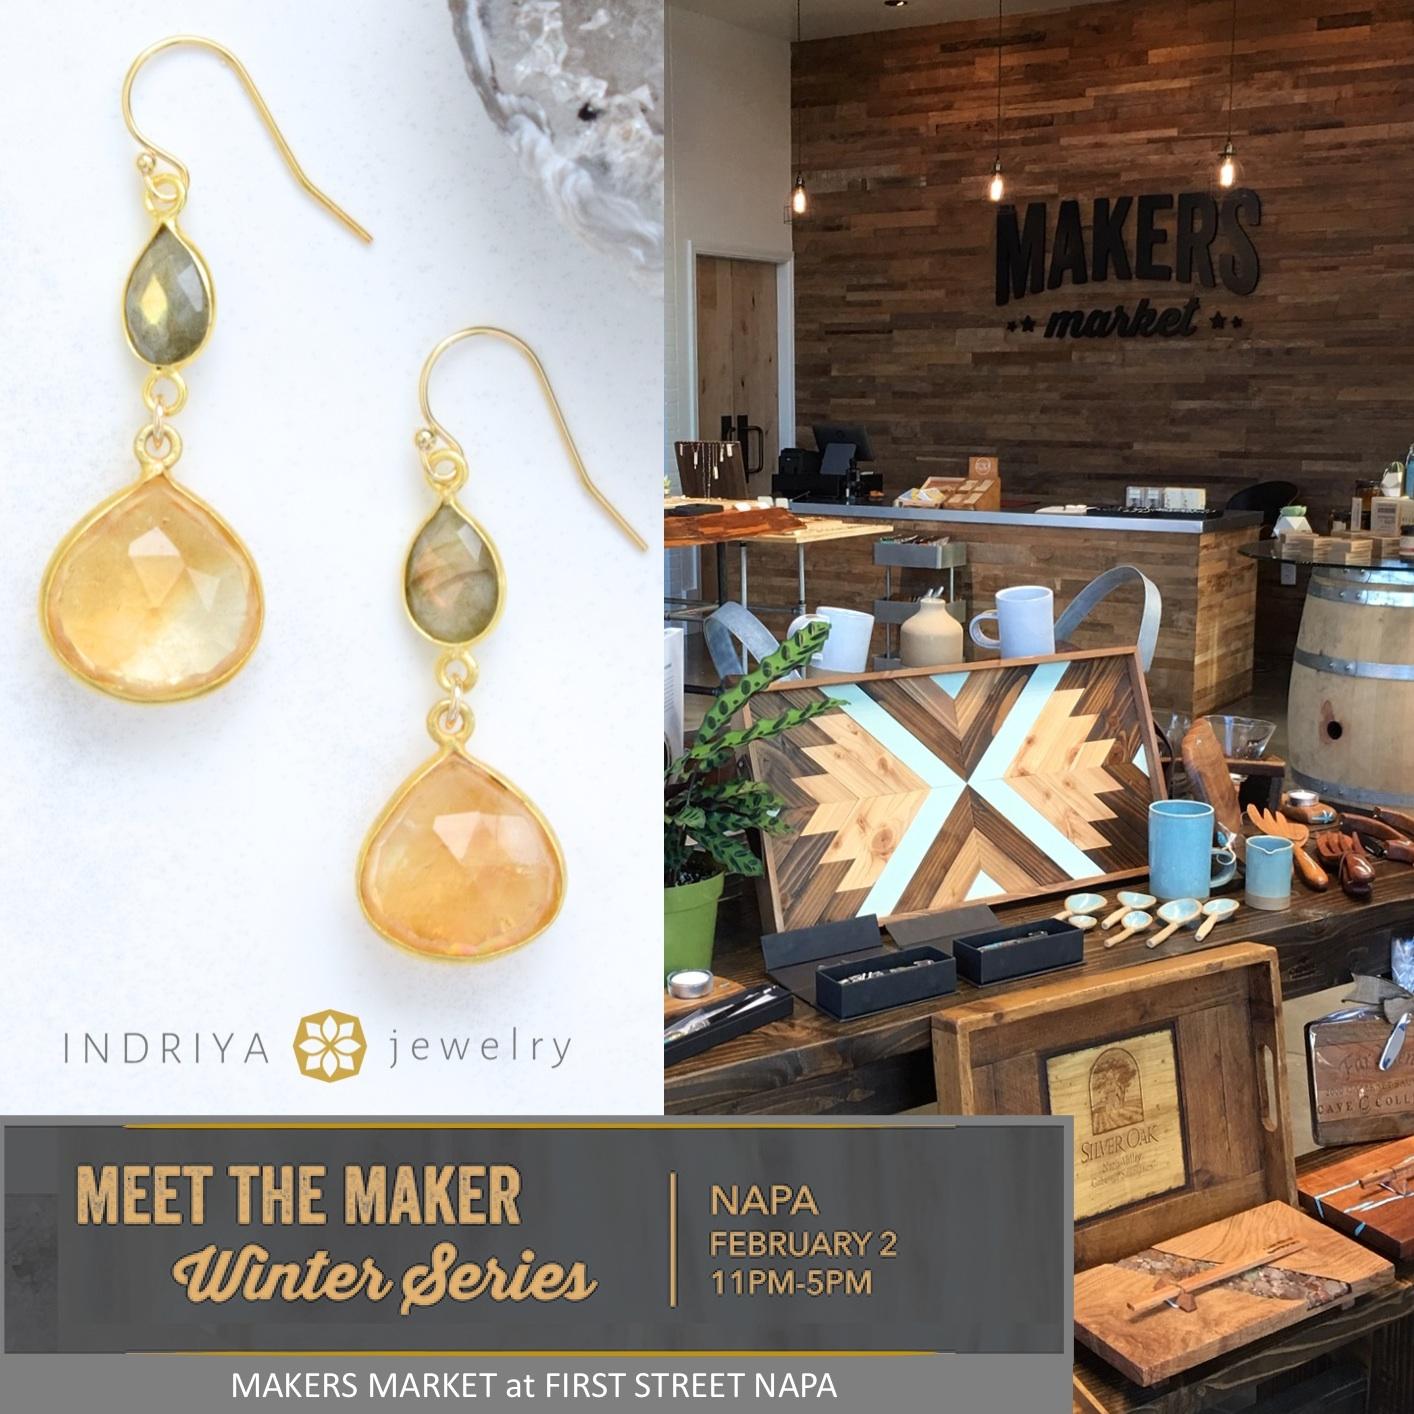 Makers Market Indriya Jewelry